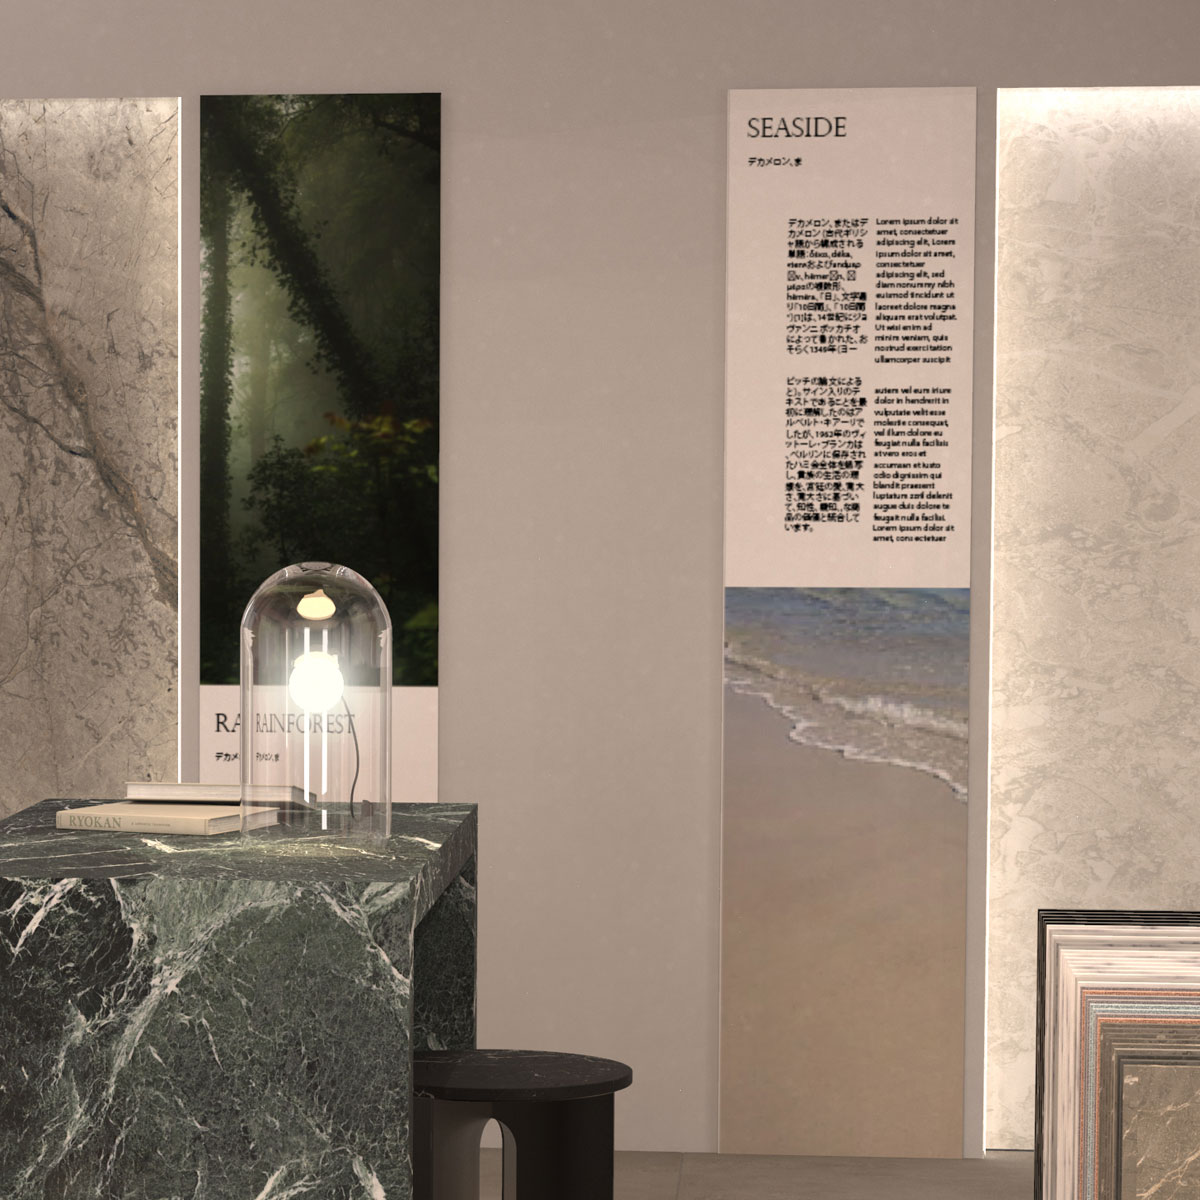 Sistemi espositivi pietre e mosaici in mdf